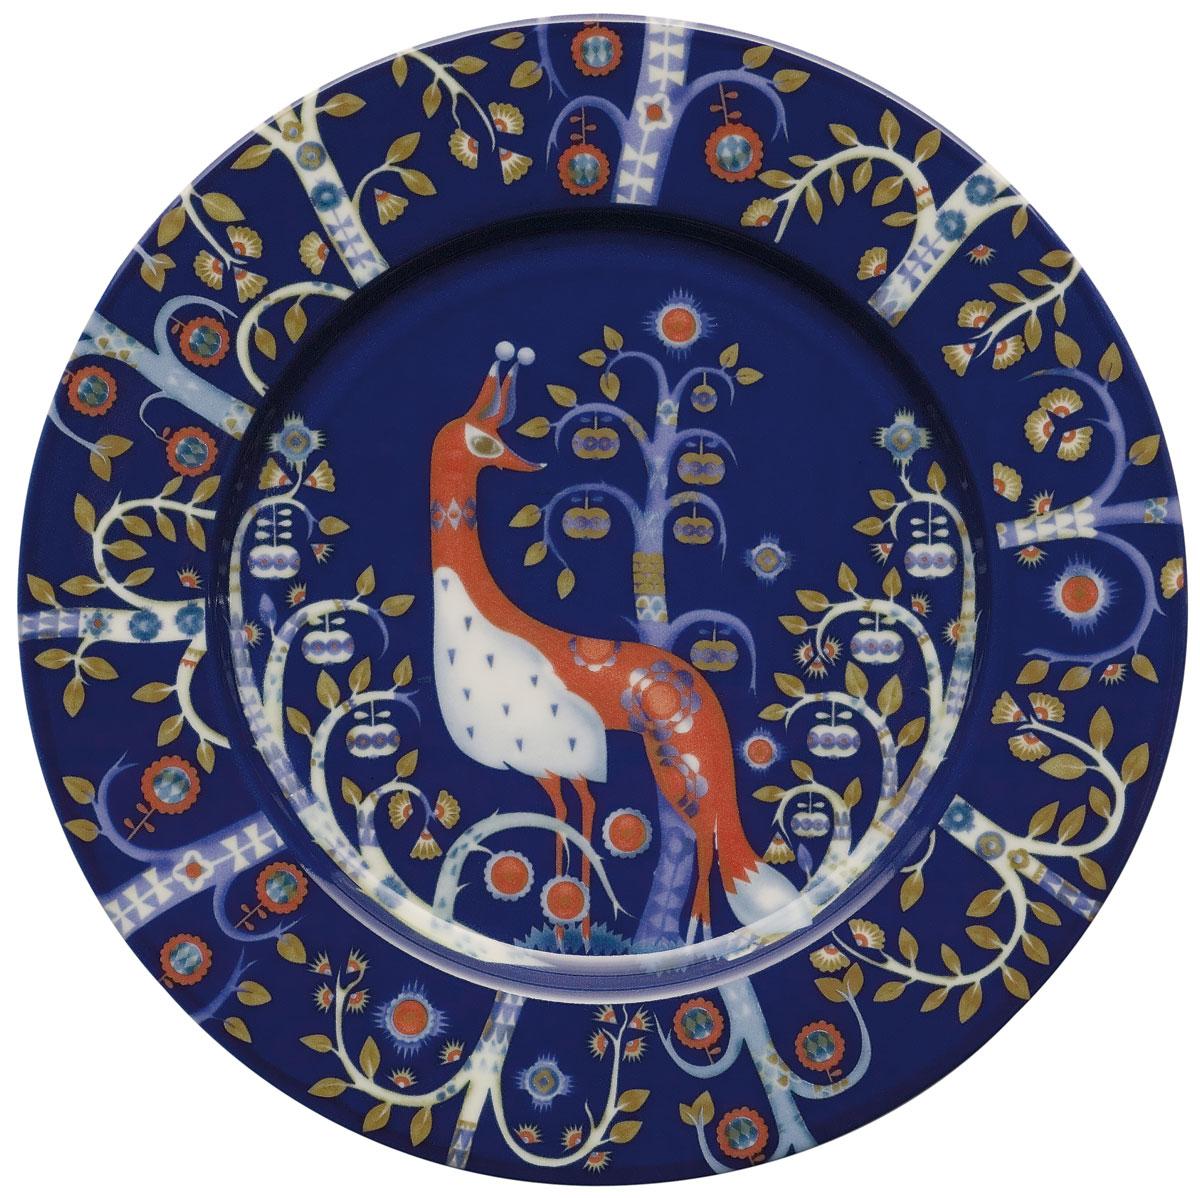 Тарелка Iittala Taika, цвет: синий, диаметр 22 см1012442